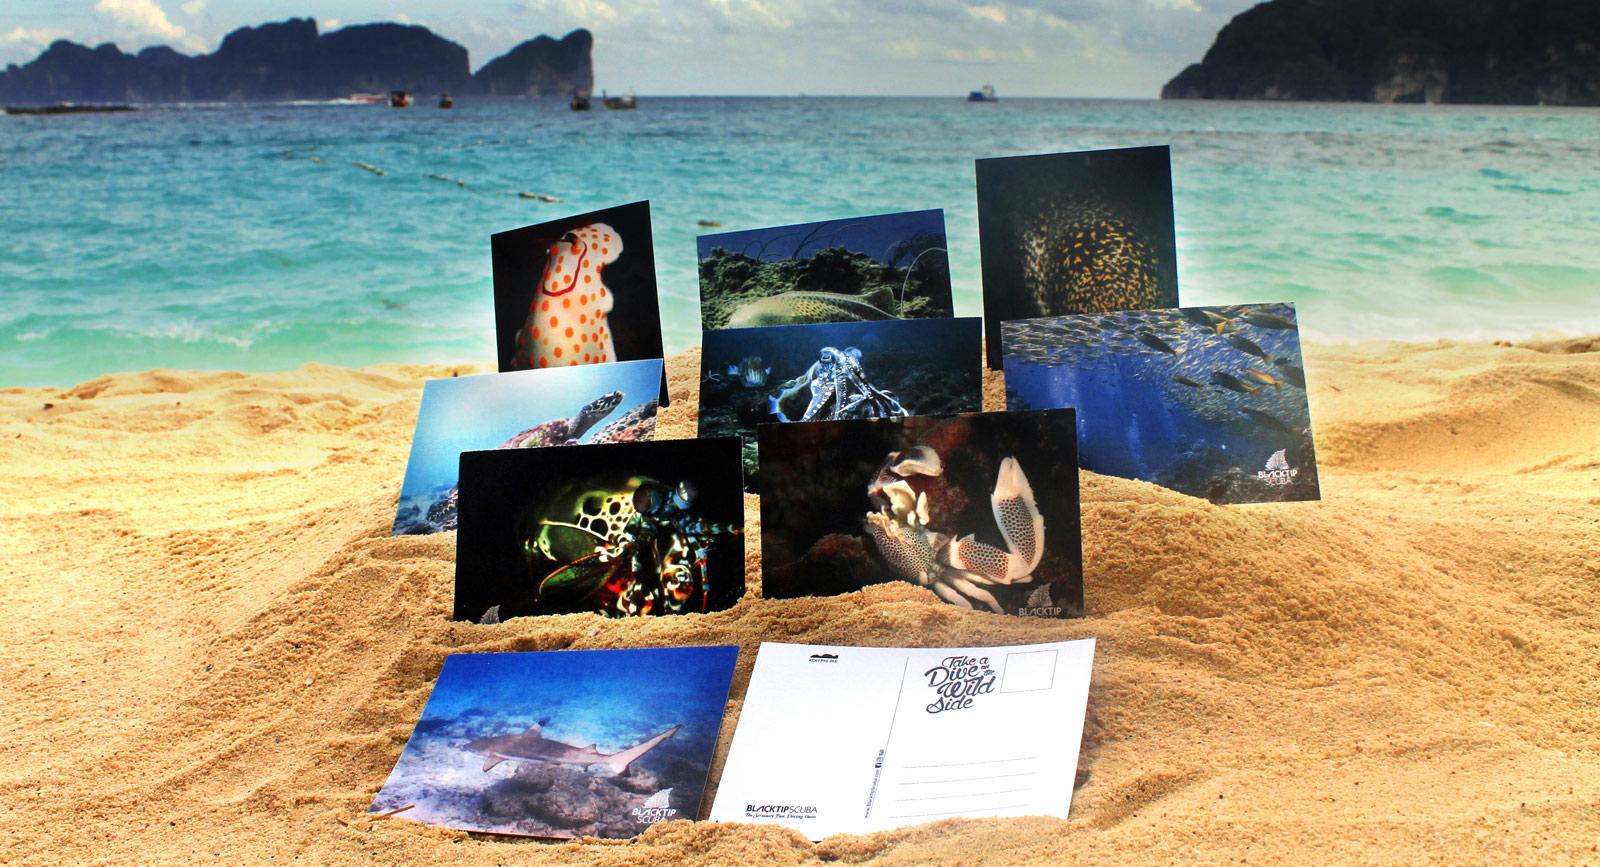 scuba diving dive center merchandising